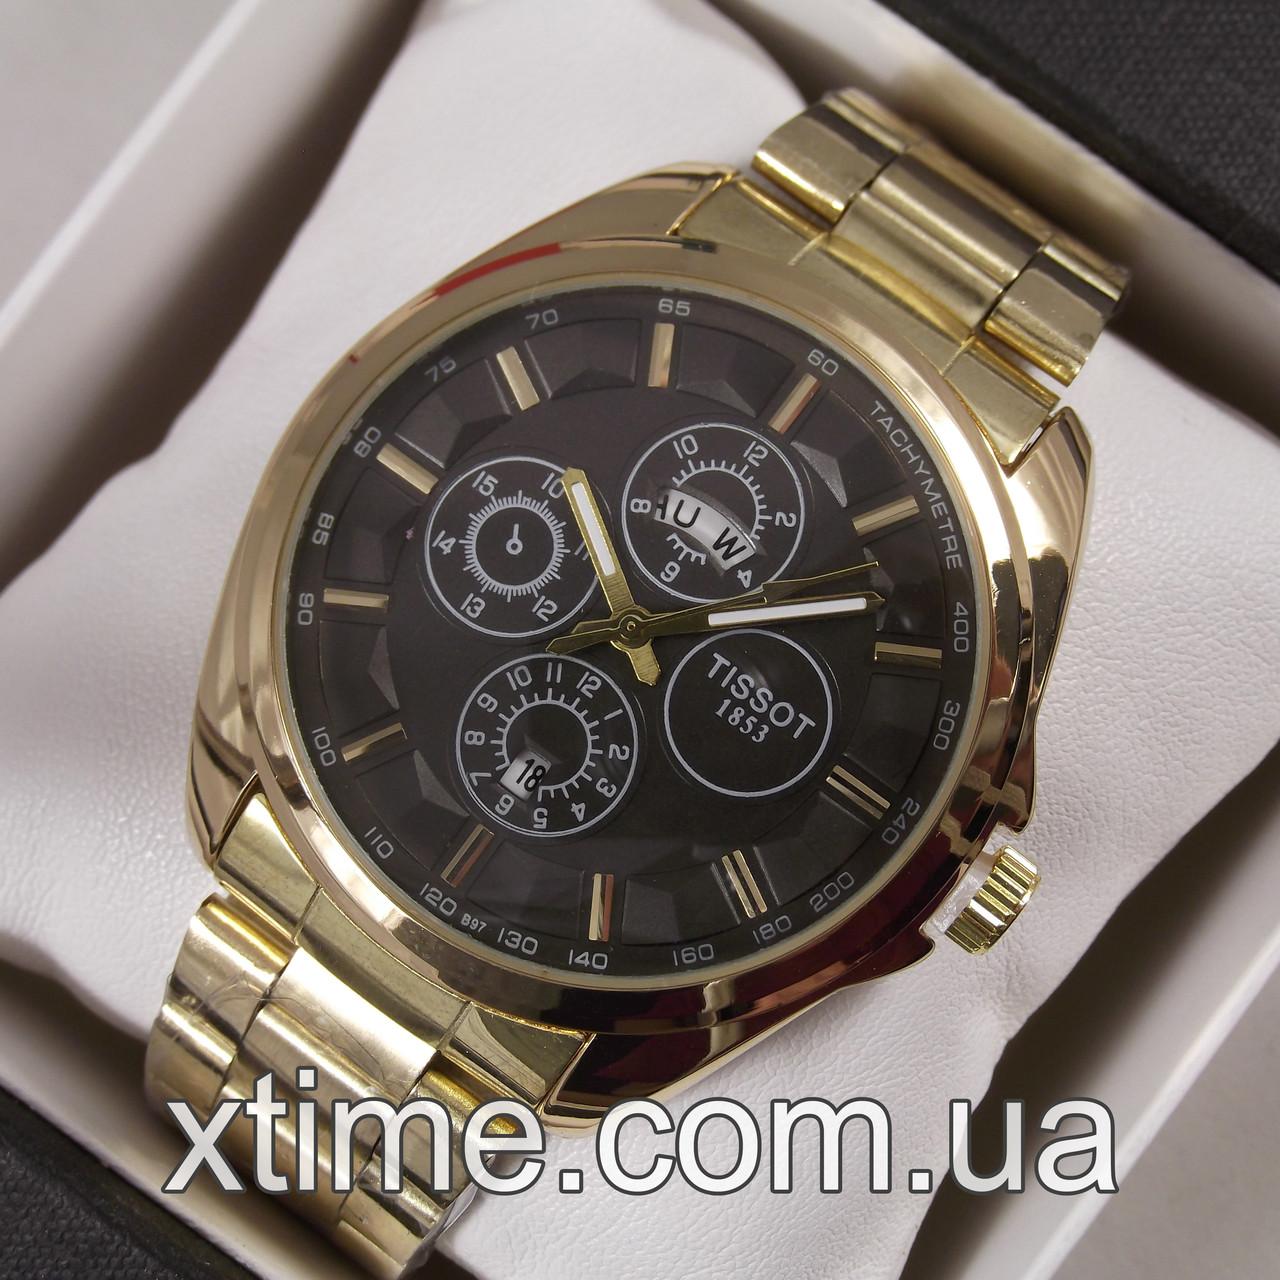 Часы tissot мужские китай фото